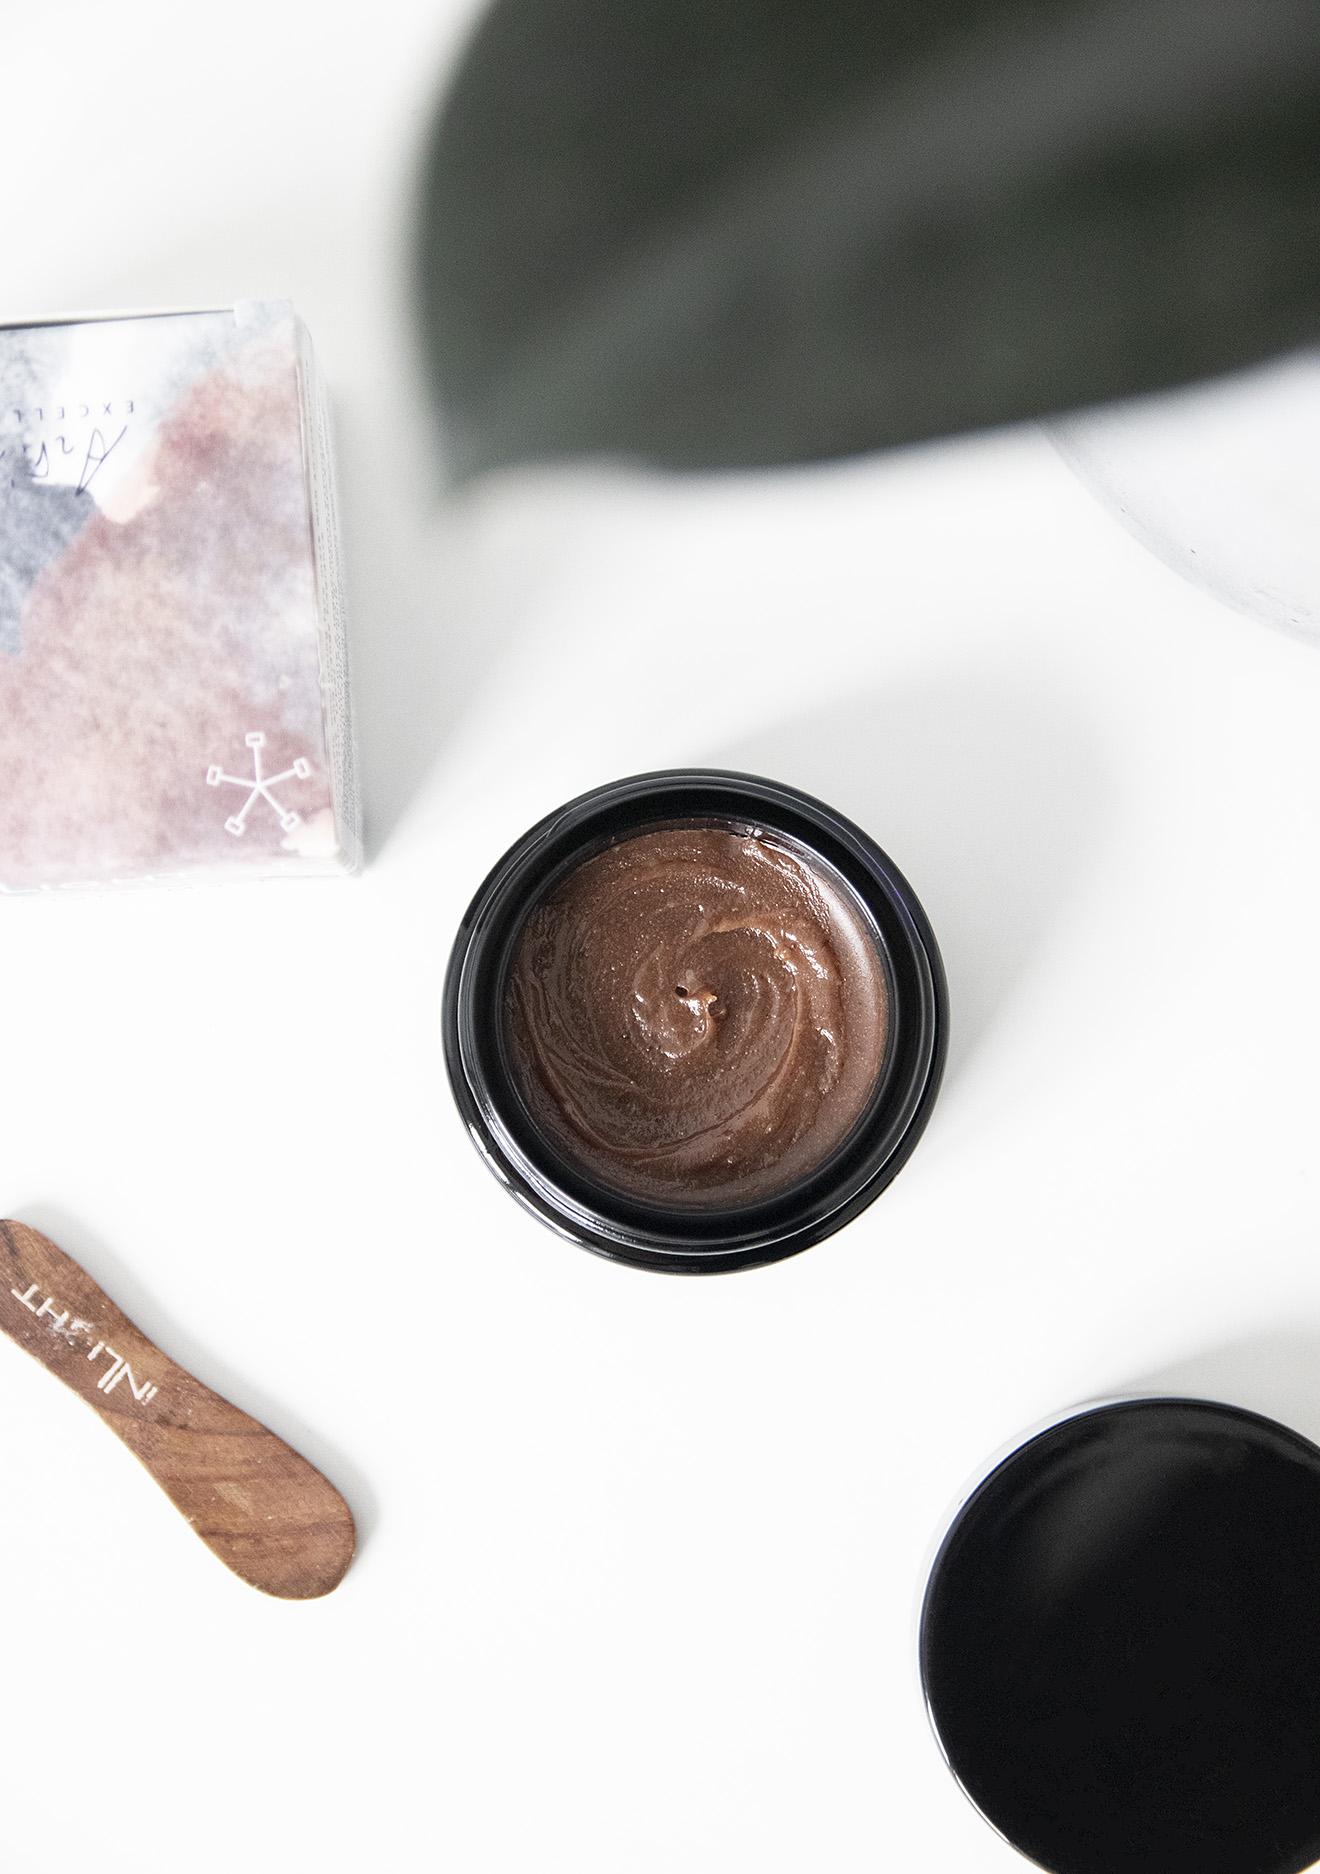 Inlight Organic Chocolate Mask Review